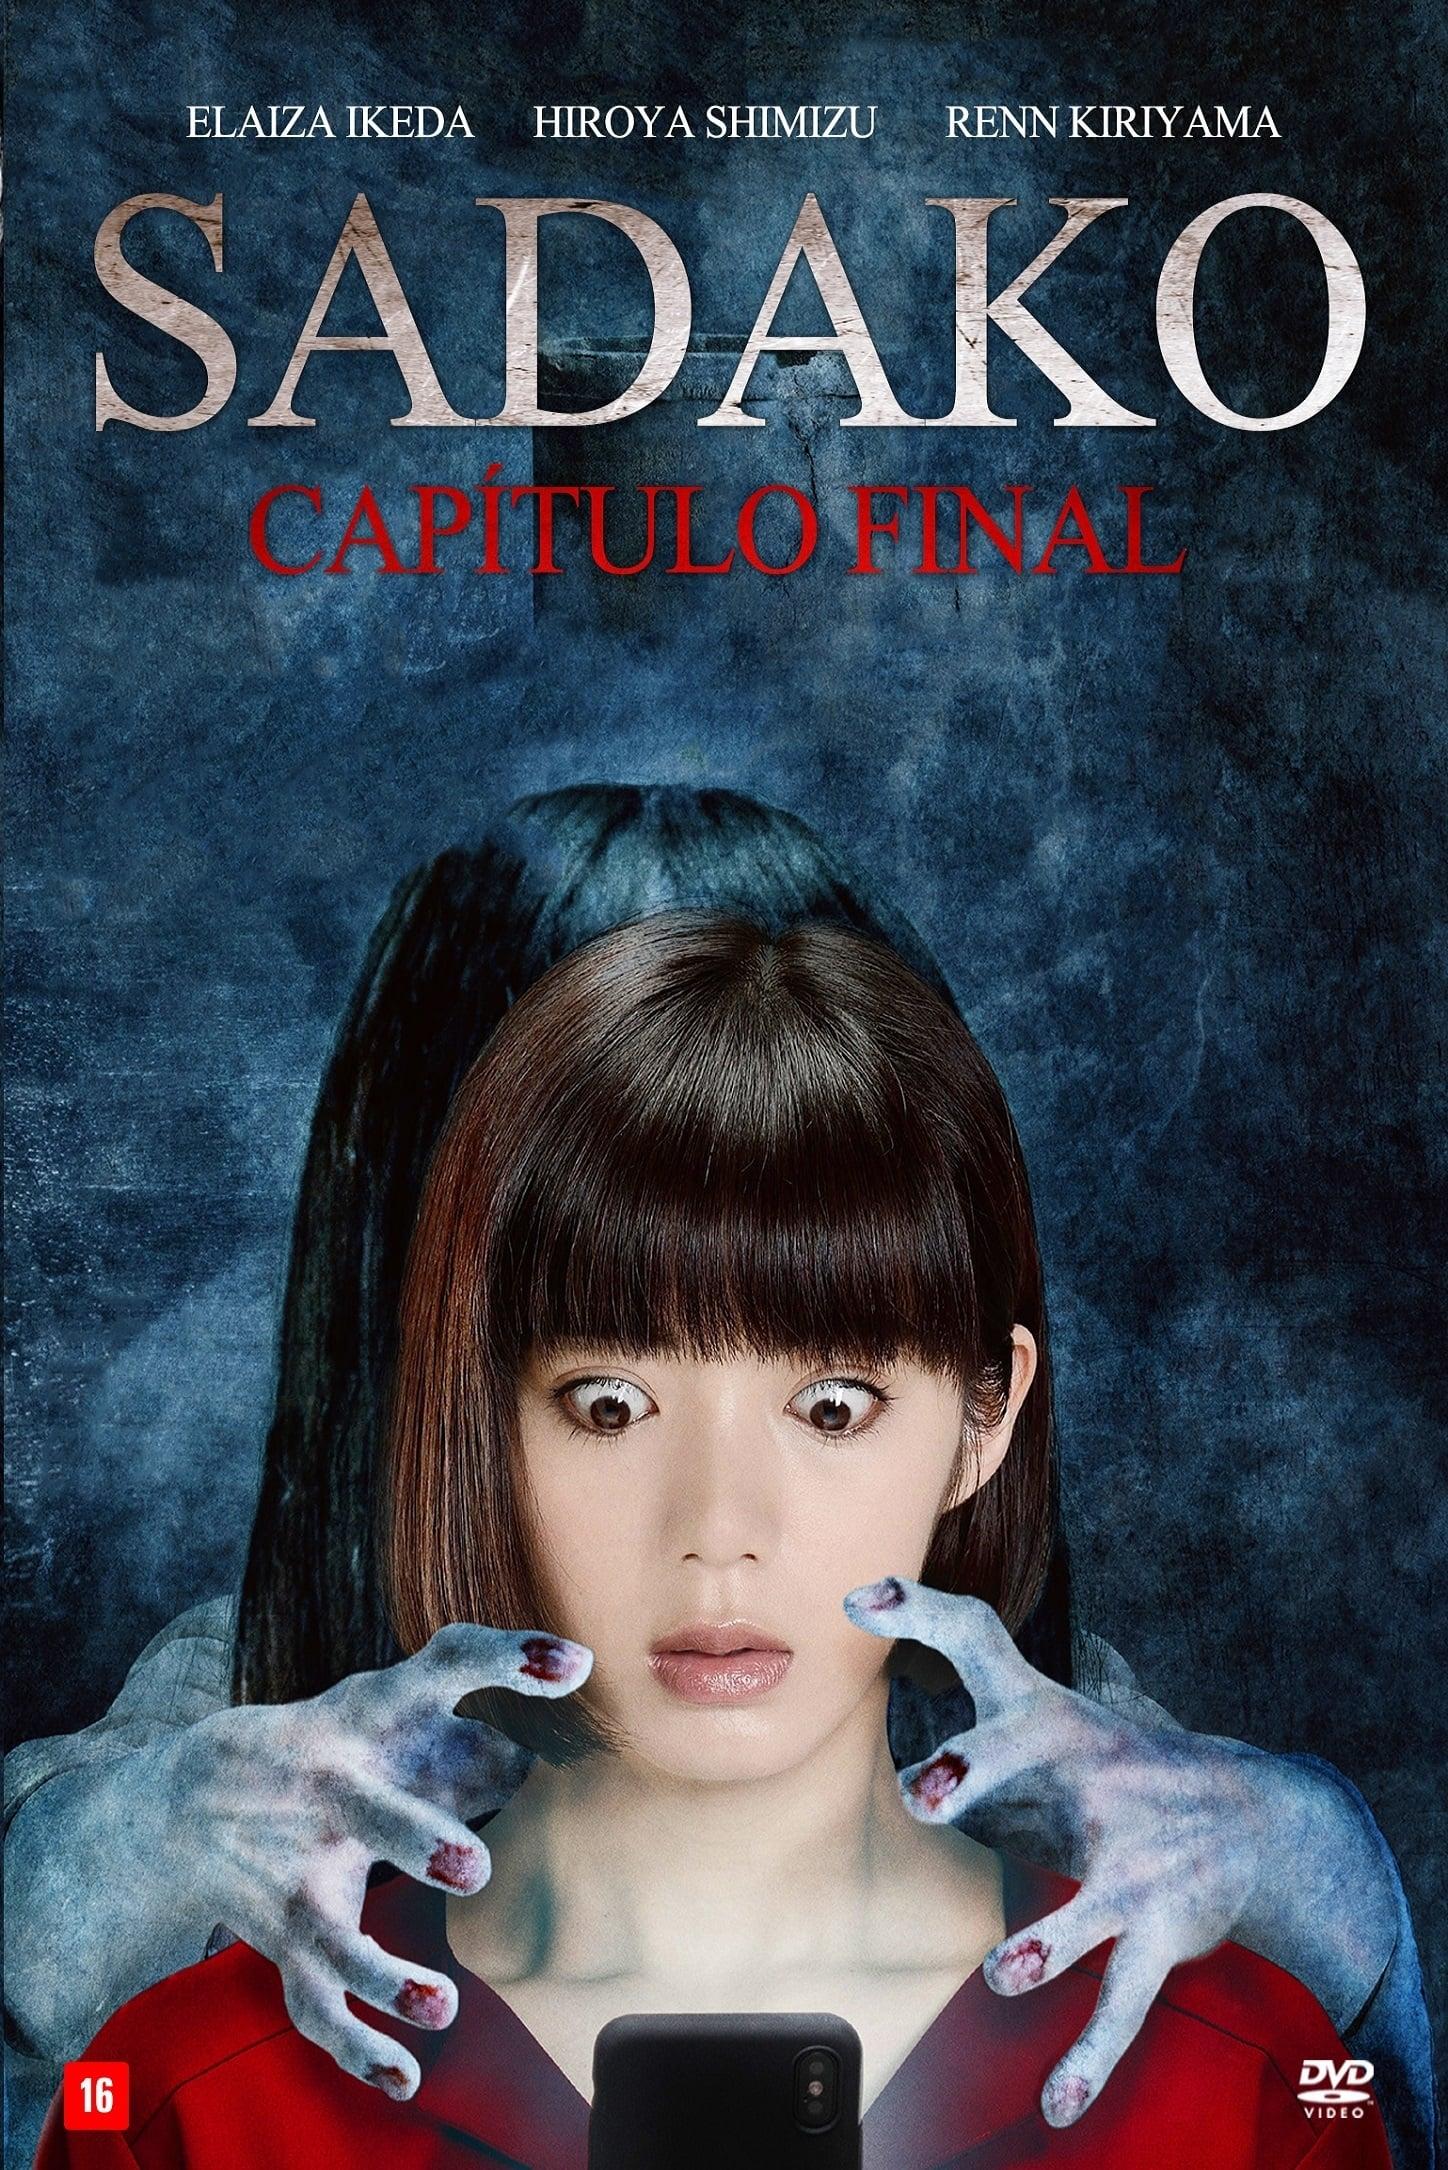 Sadako: Capítulo Final Torrent (2020) Dual Áudio / Dublado WEB-DL 720p | 1080p FULL HD – Download